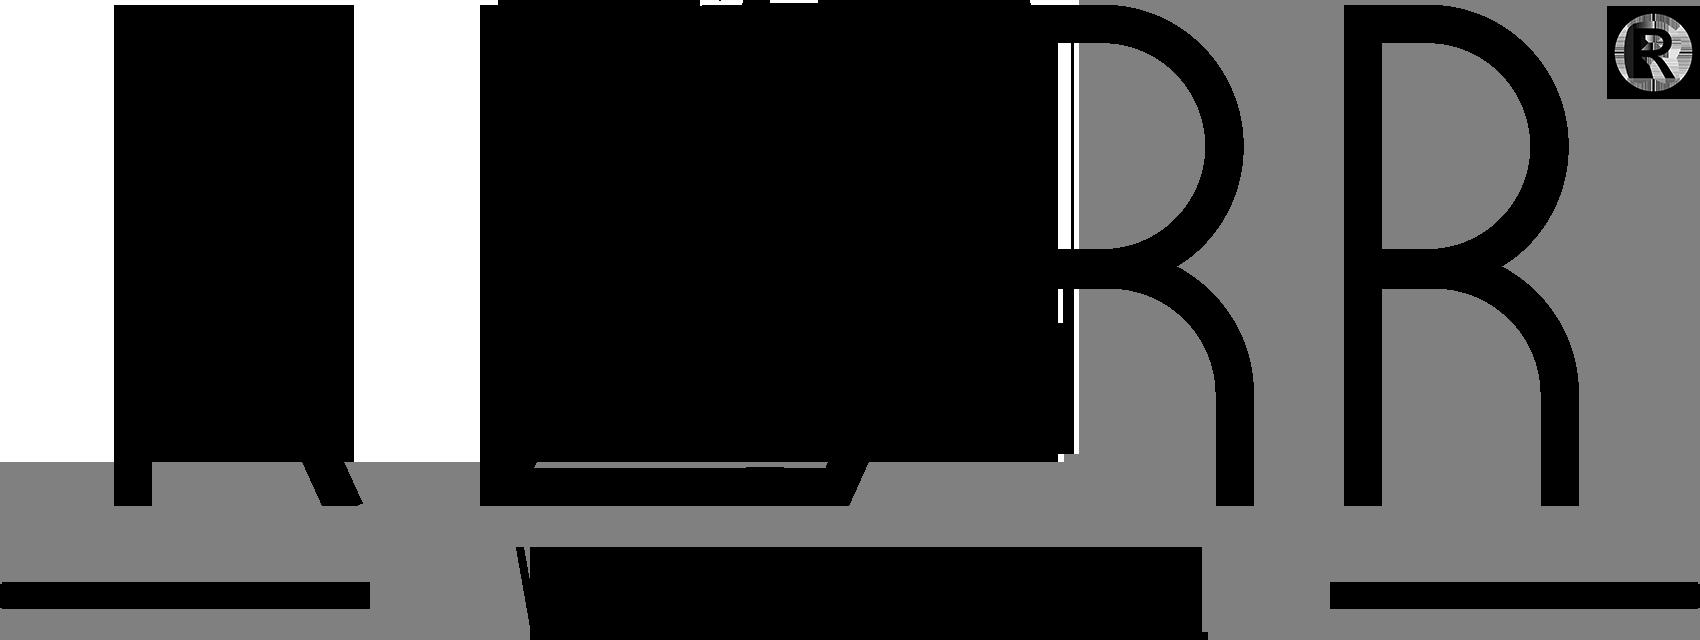 Kierr logo